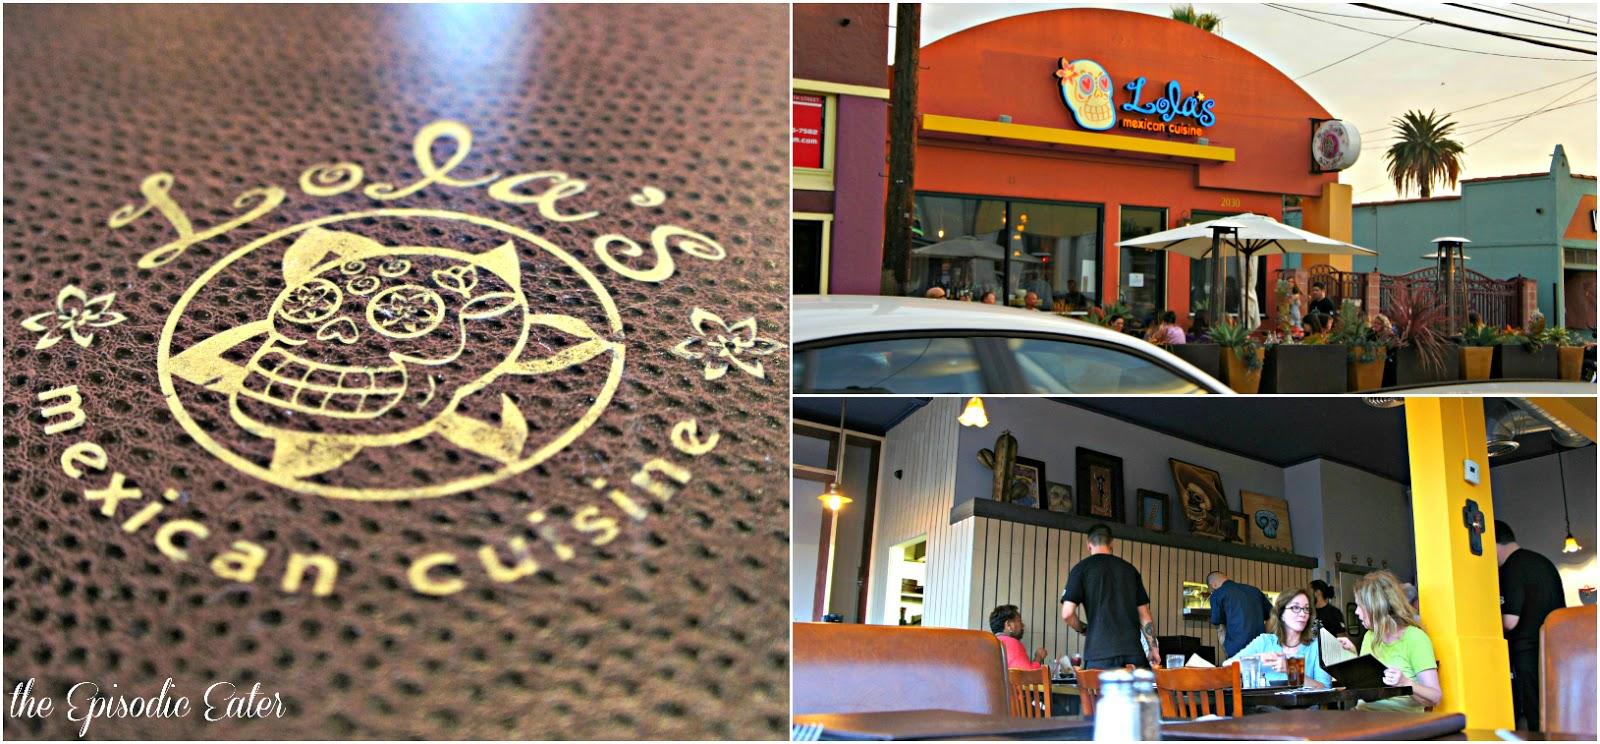 Lola's (Long Beach, CA) on The Episodic Eater